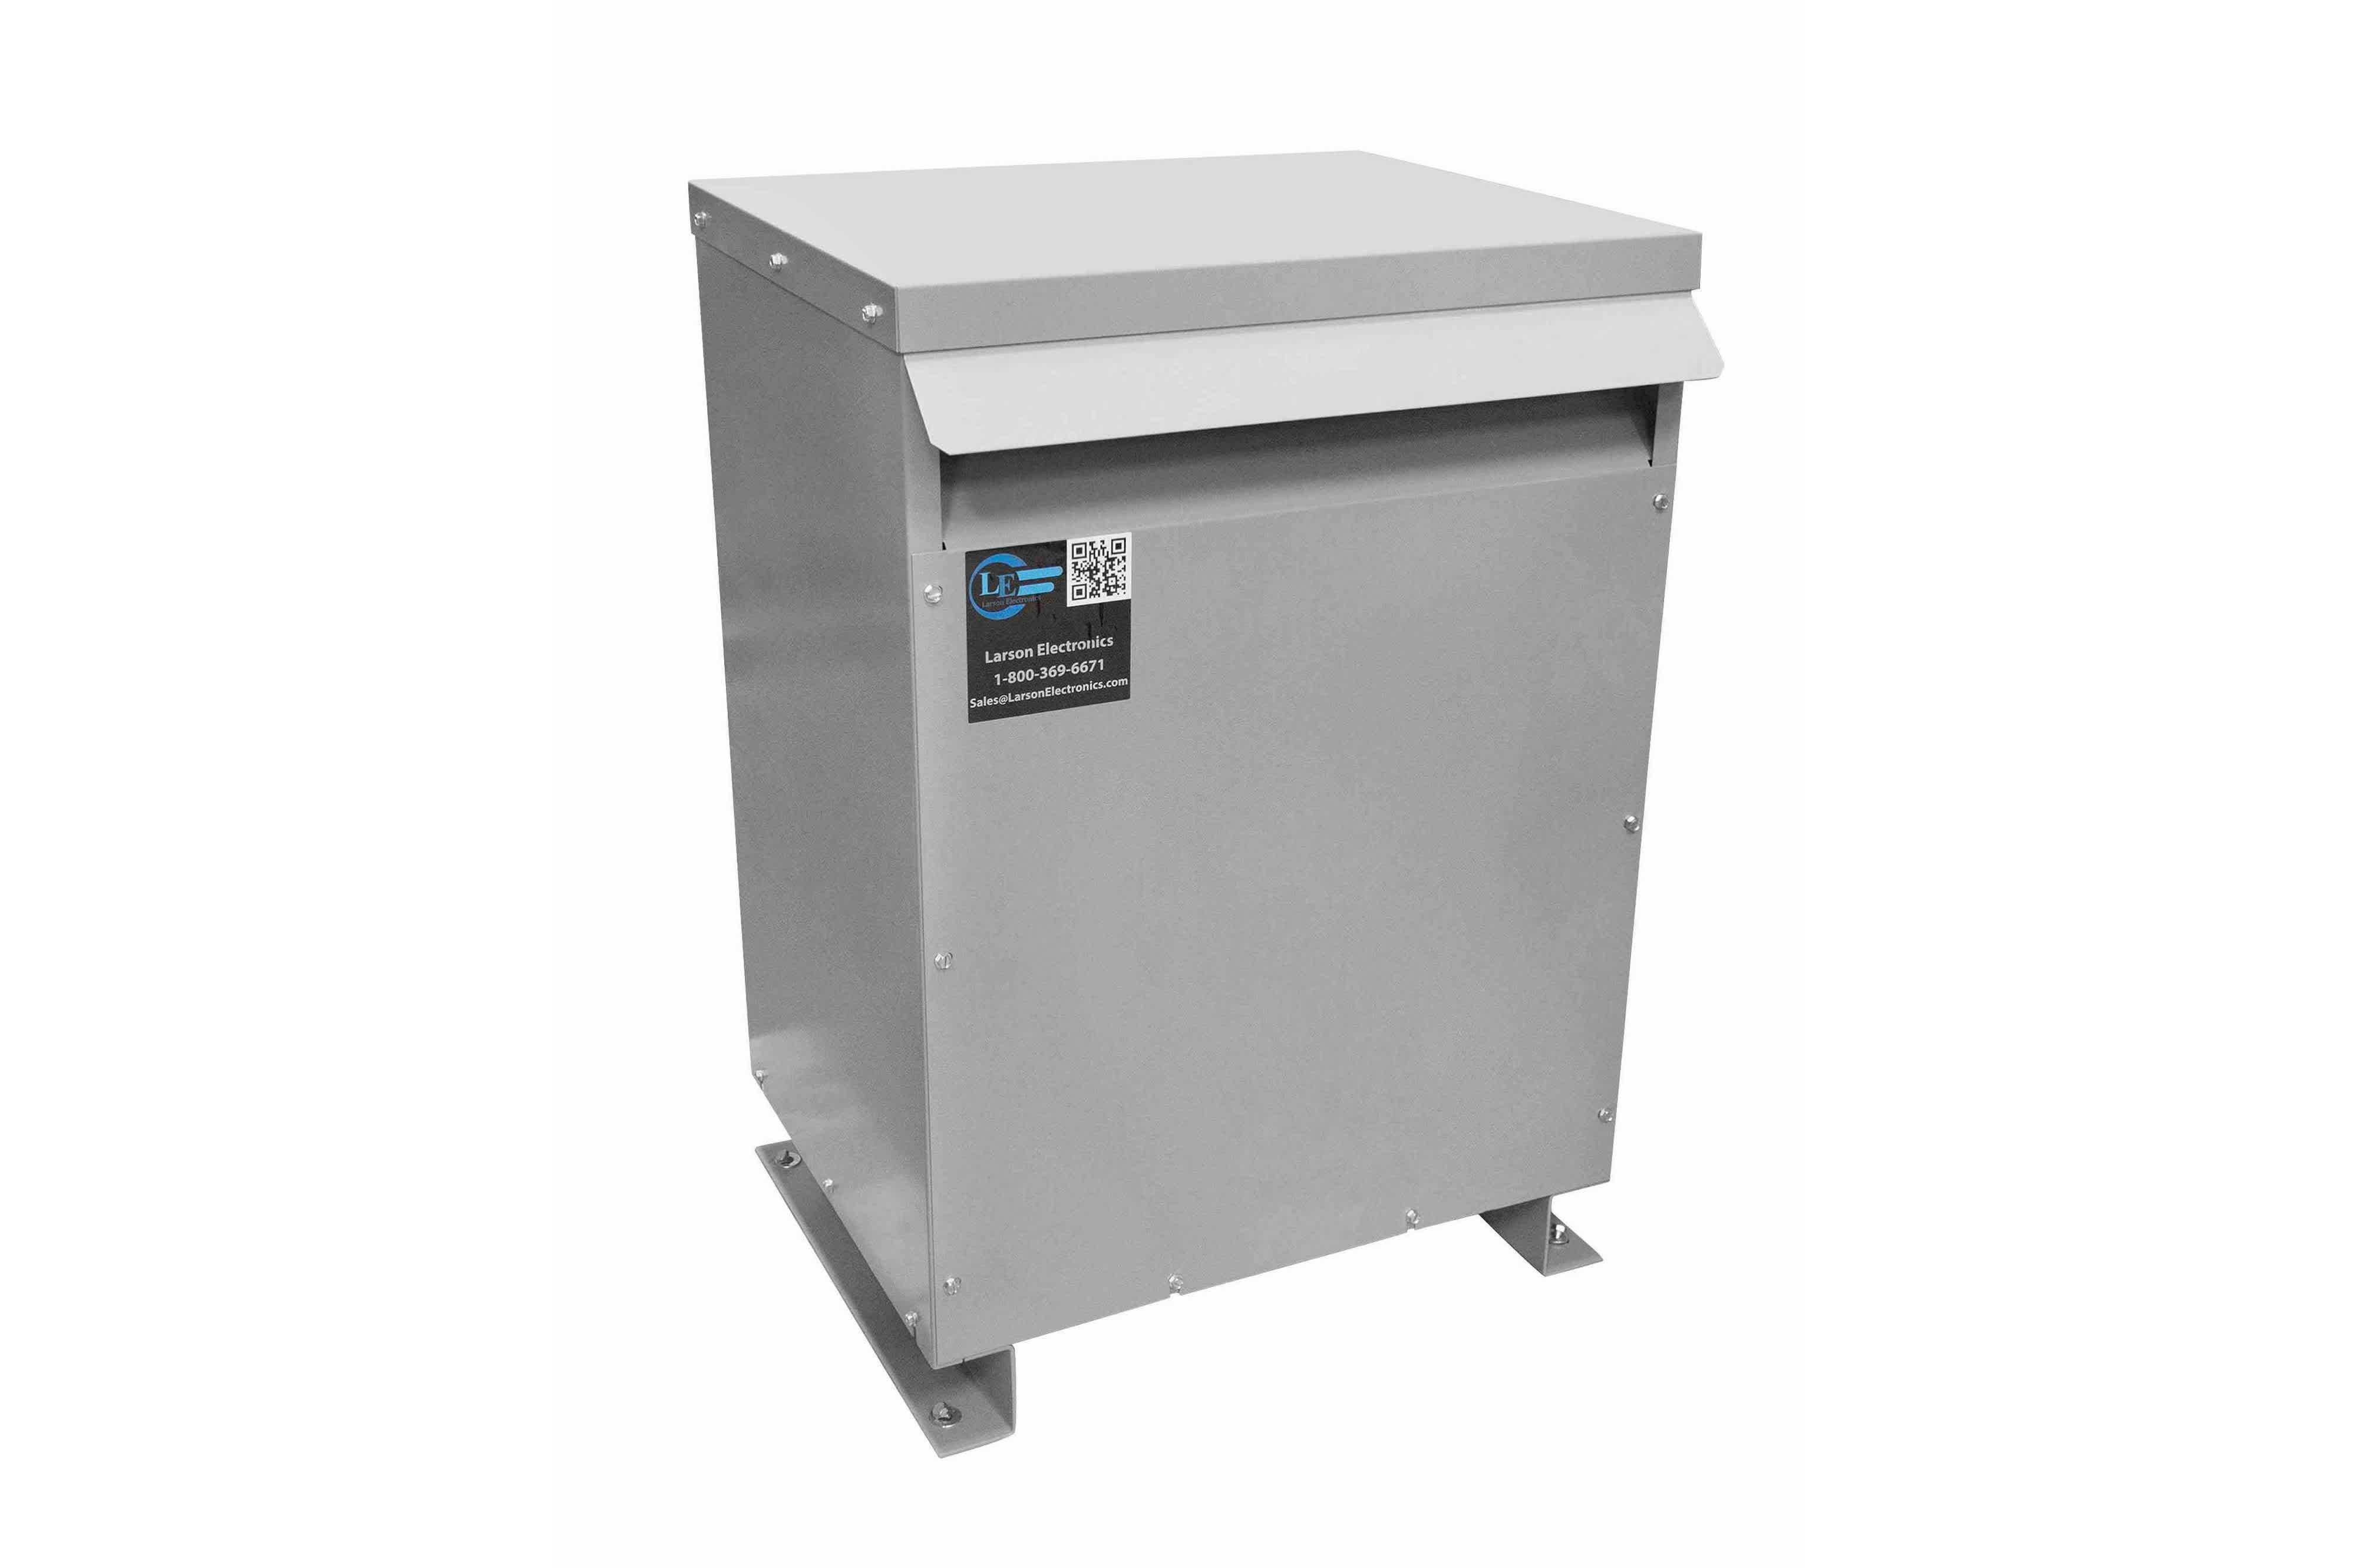 50 kVA 3PH Isolation Transformer, 208V Wye Primary, 208V Delta Secondary, N3R, Ventilated, 60 Hz